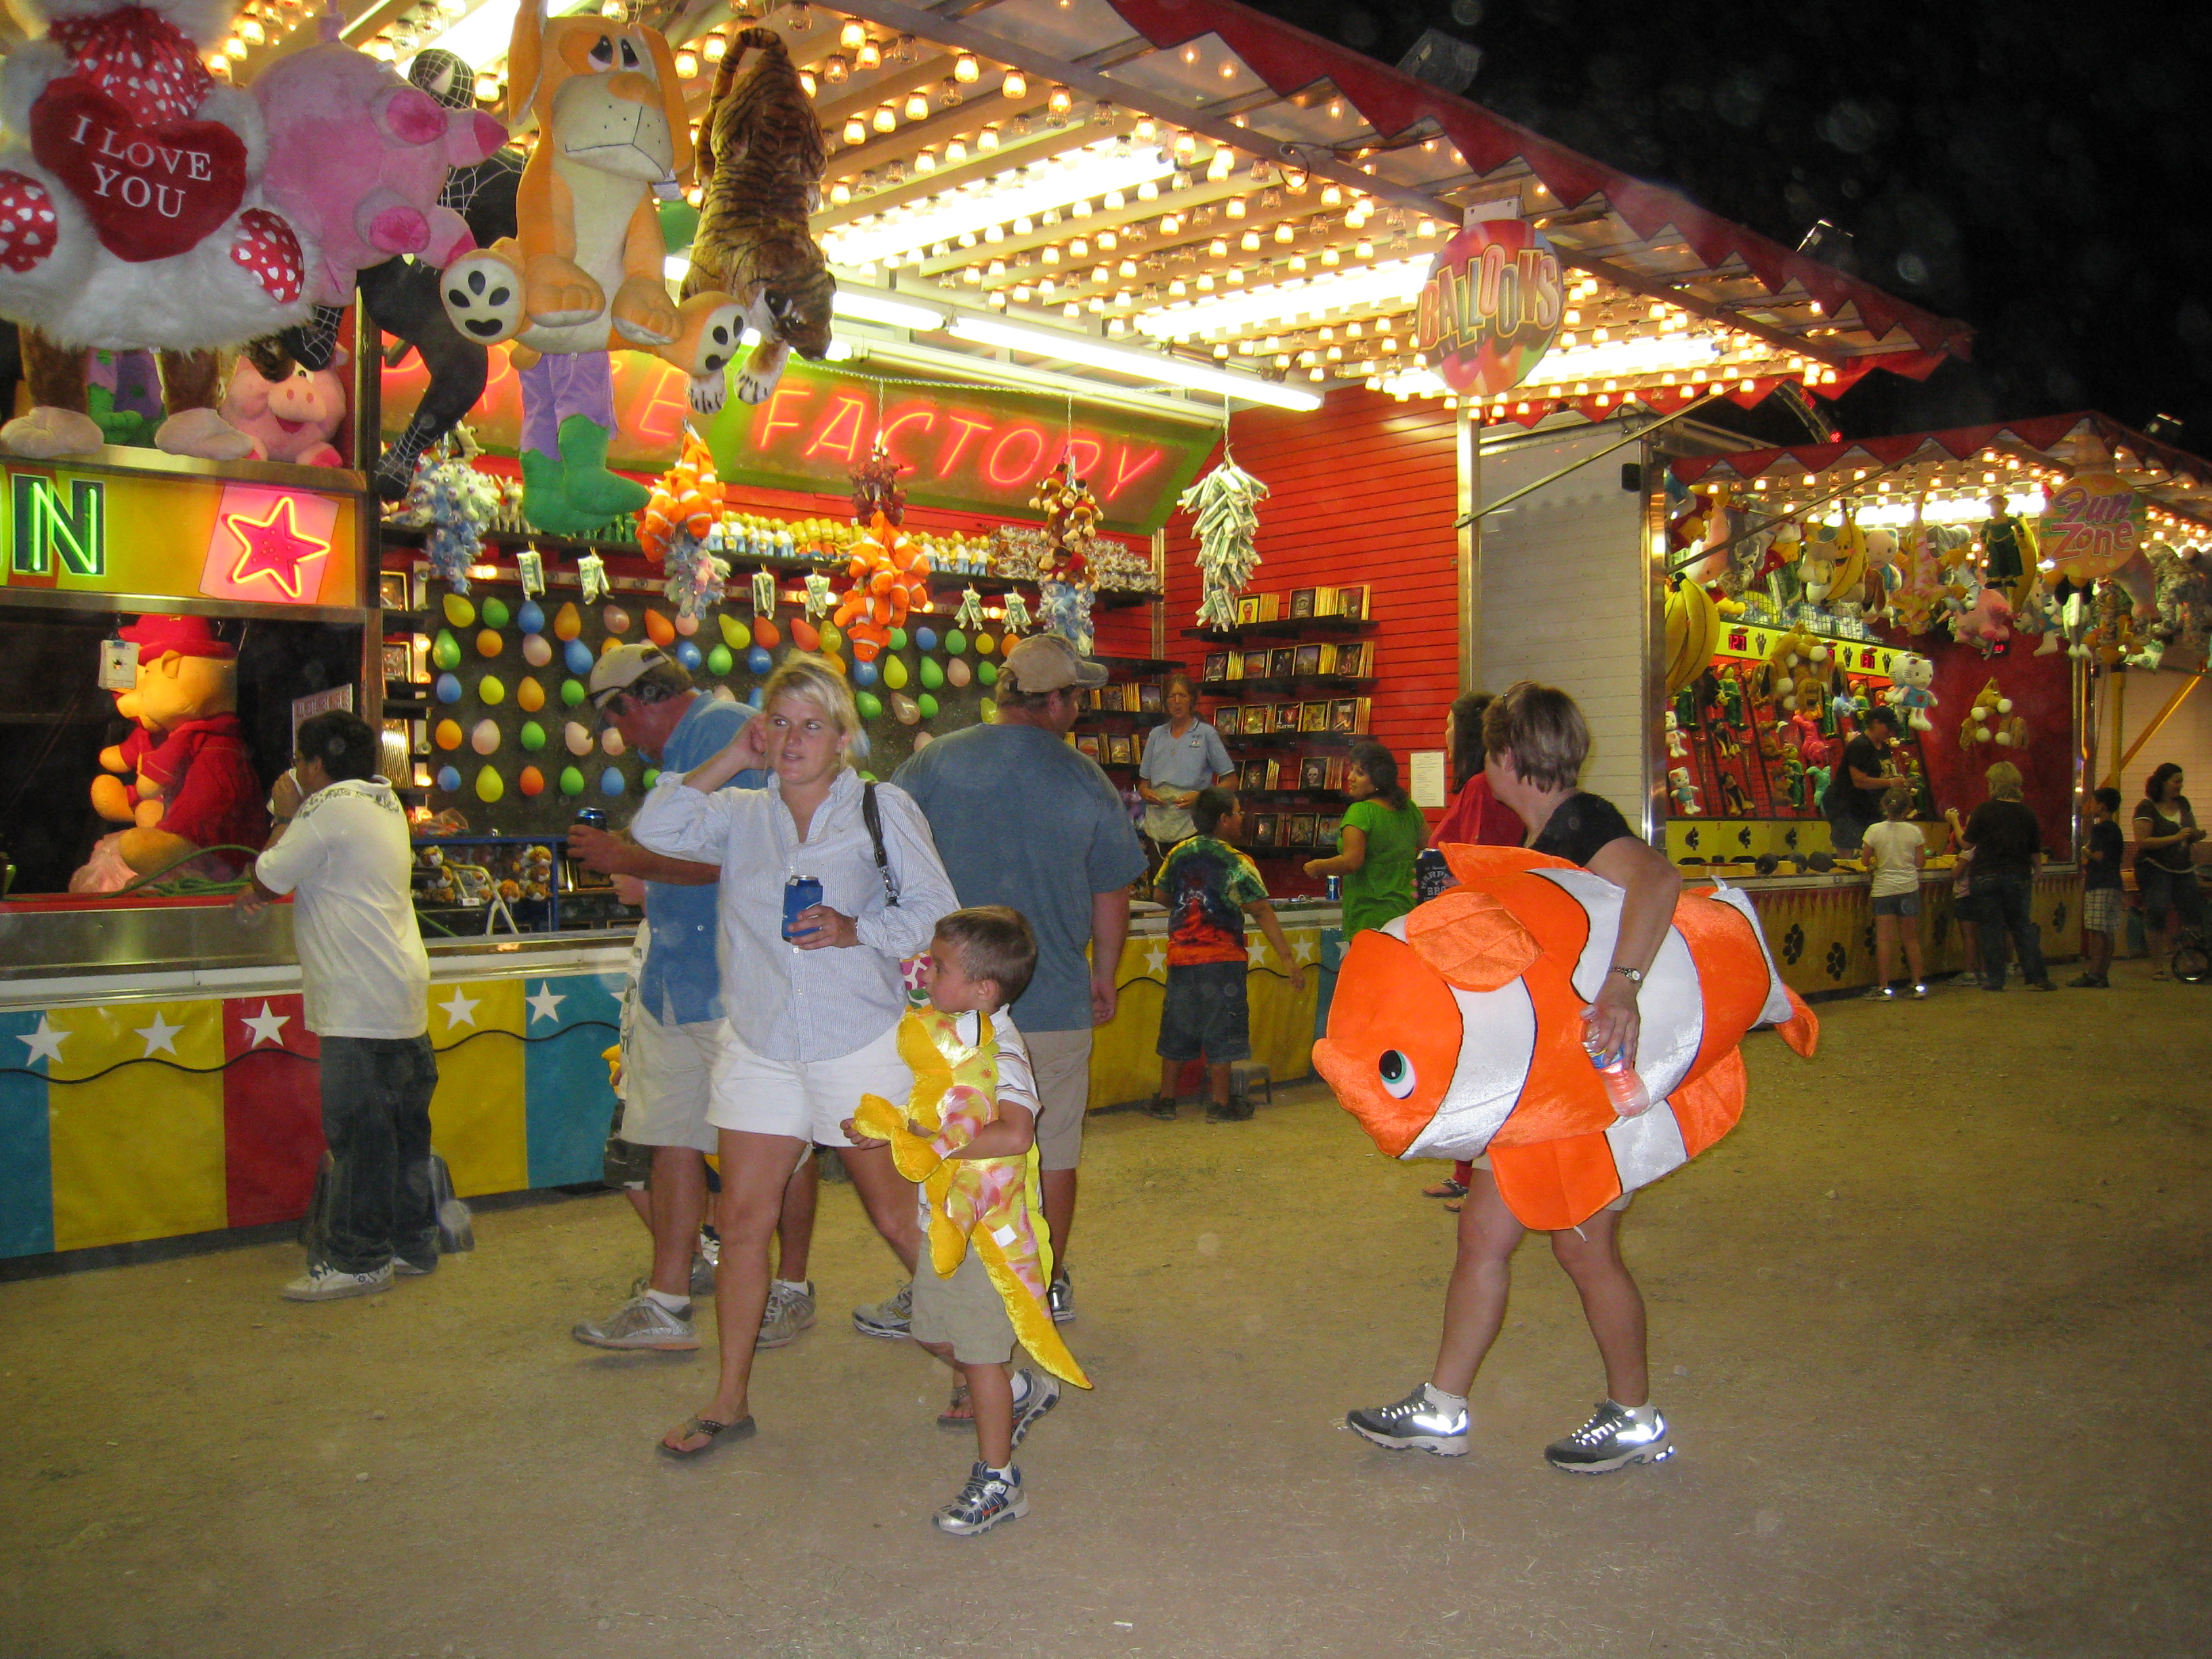 Gillespie County Fair 171 Fredericksburg S Friendly Blog